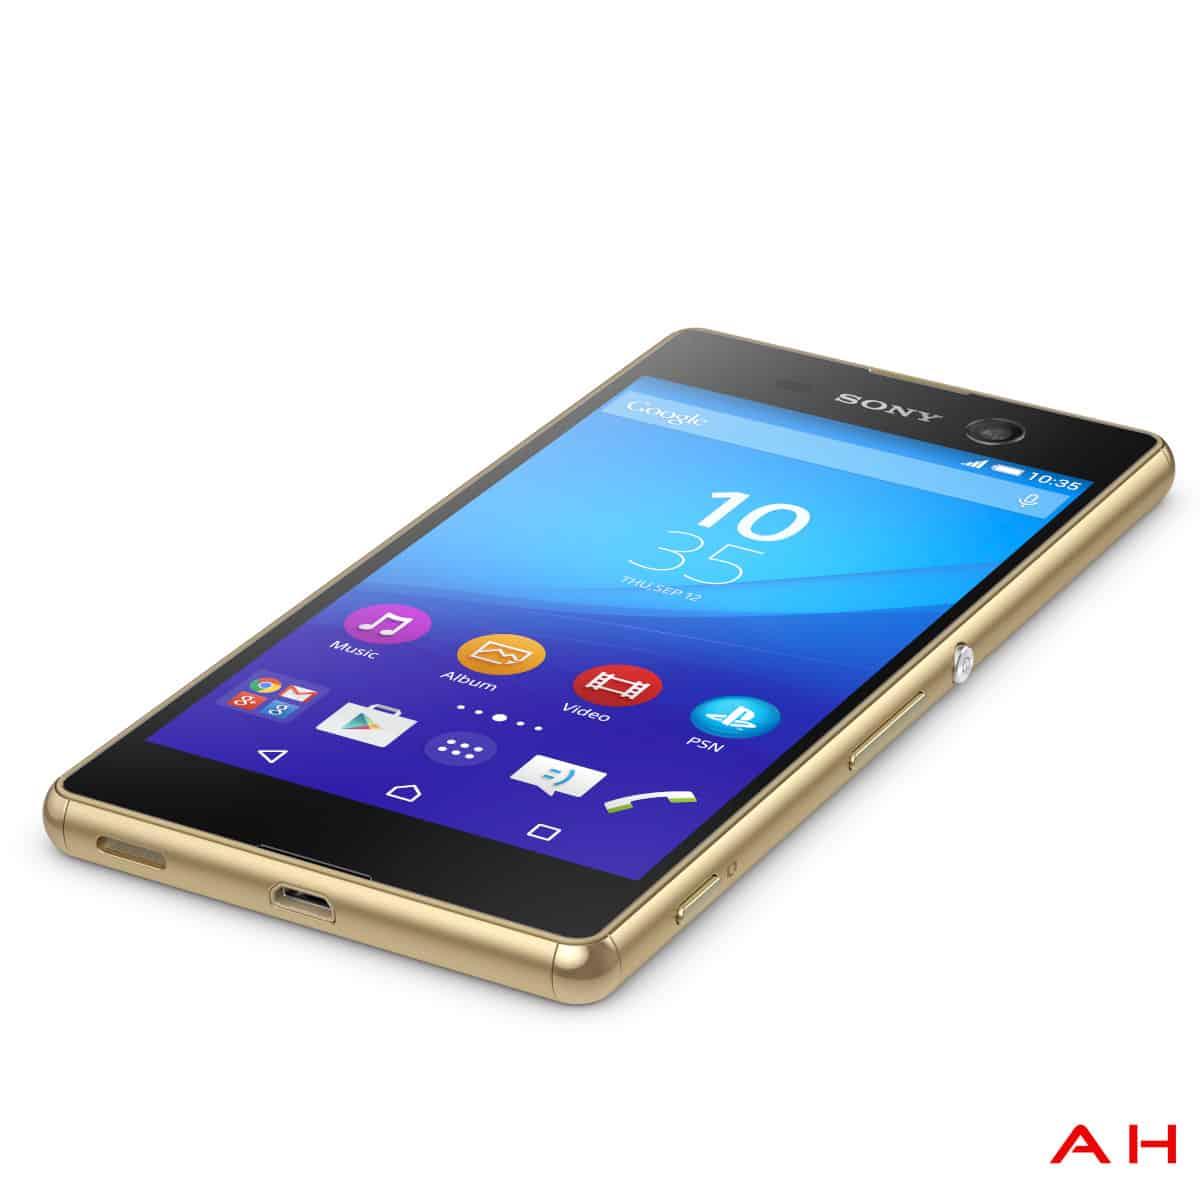 AH Sony Xperia M5 Press Images 7